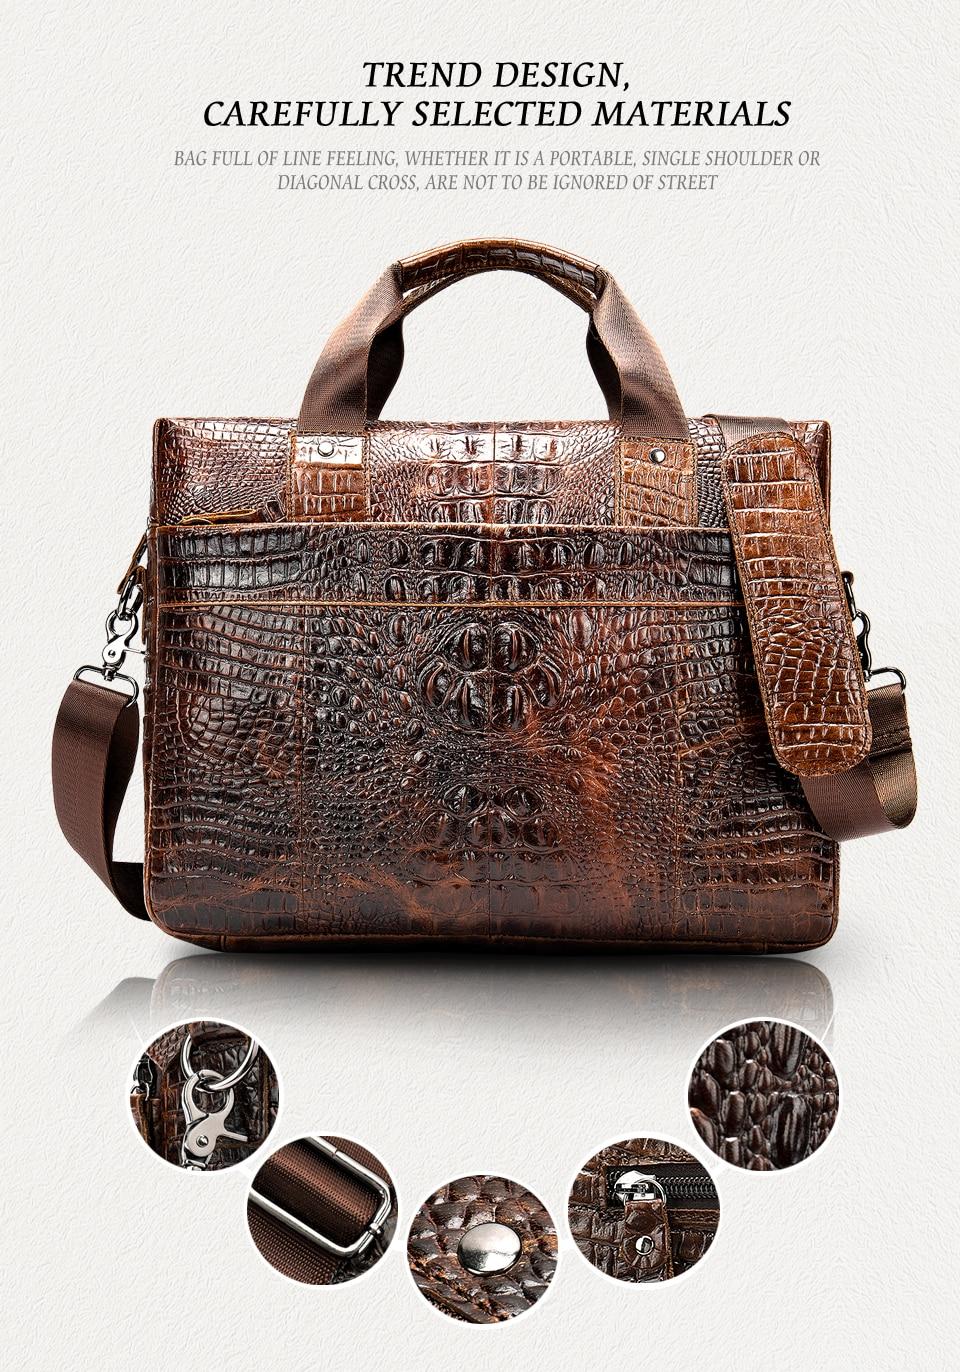 Haa65d9a778be4997a2a64f057de68cfa5 WESTAL Men Briefcase Men's Bag Genuine Leather Office Bags for Men Laptop Bag Leather Briefcase Men Croco Design Computer Bags